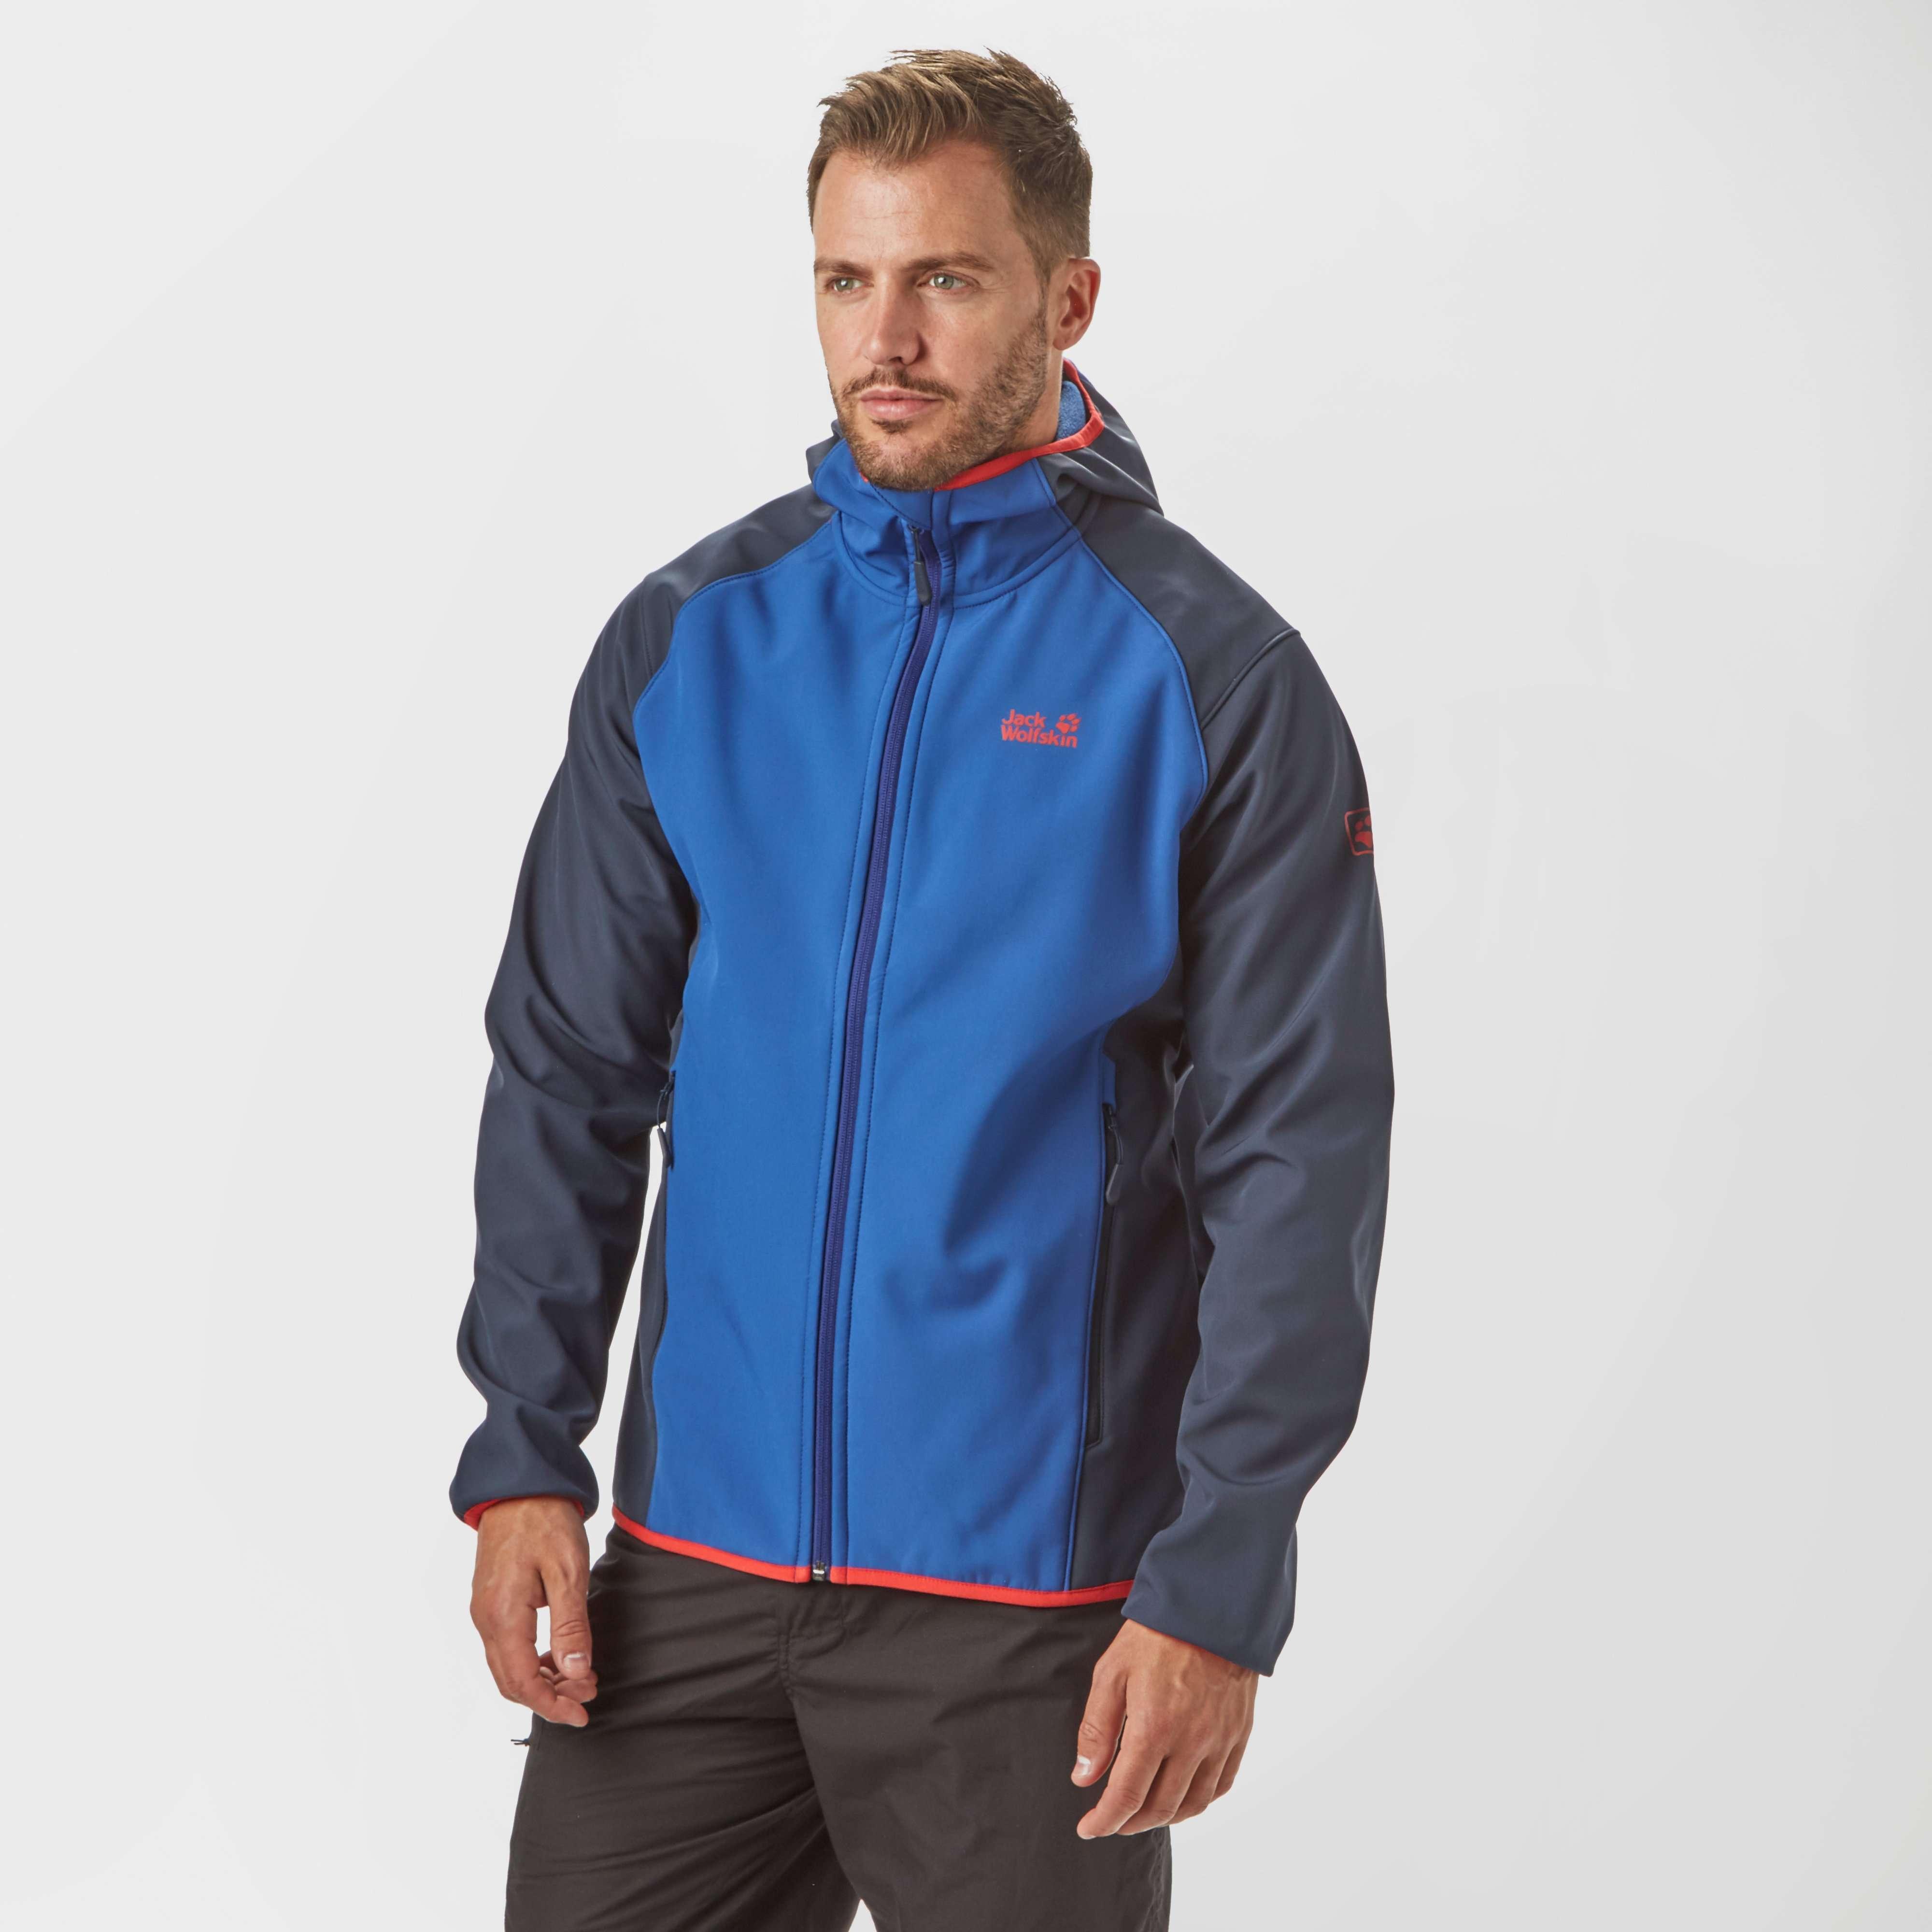 JACK WOLFSKIN Men's Zenon Softshell Jacket